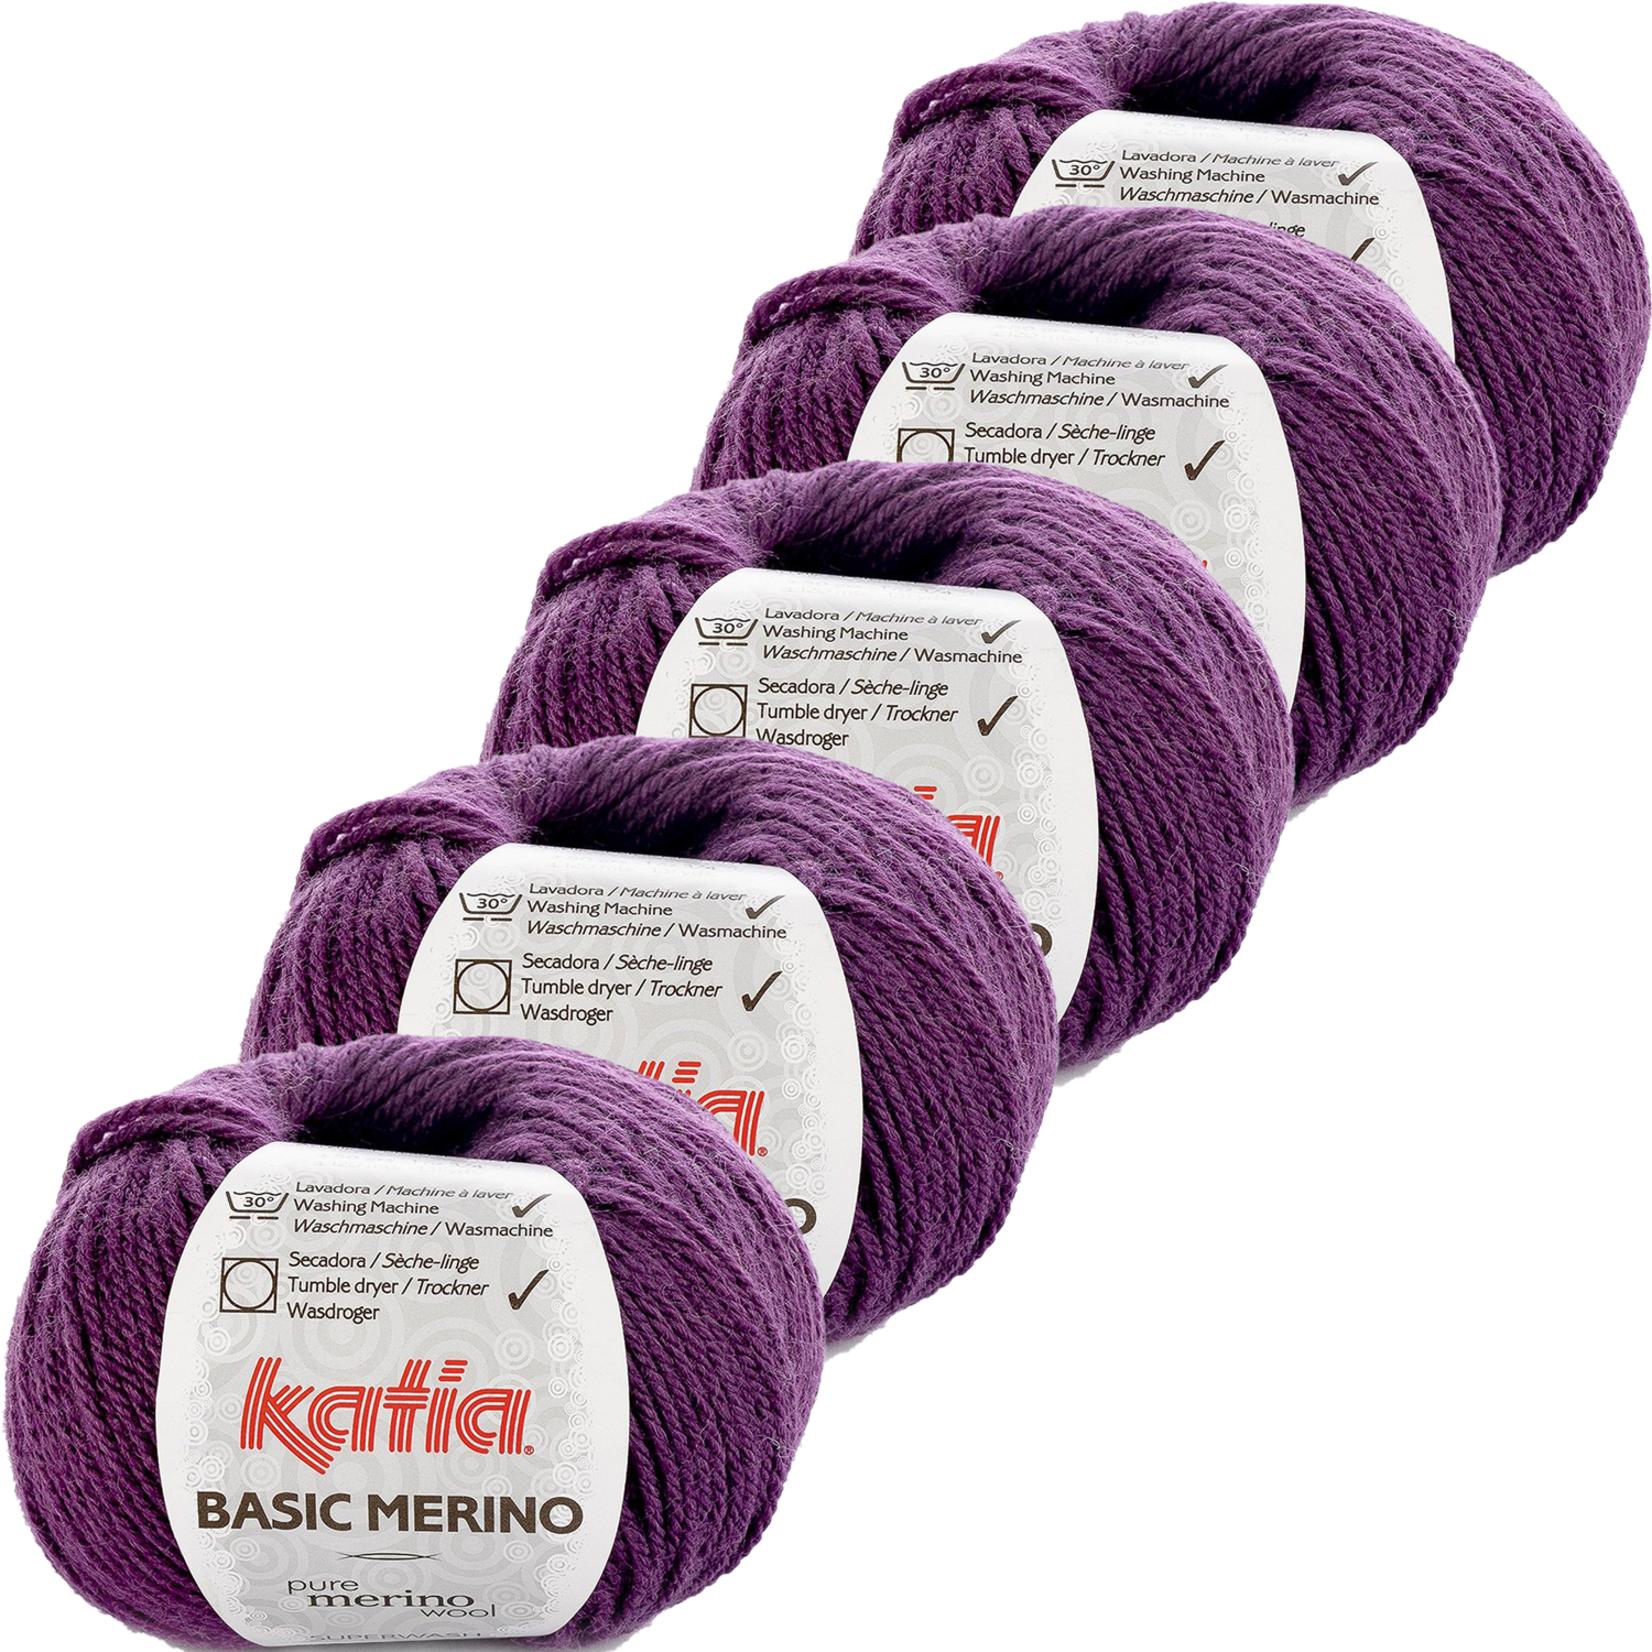 Katia Basic Merino - kleur 28_Donkerlila - bundel 5 bollen 50 gr.  van 120 m.